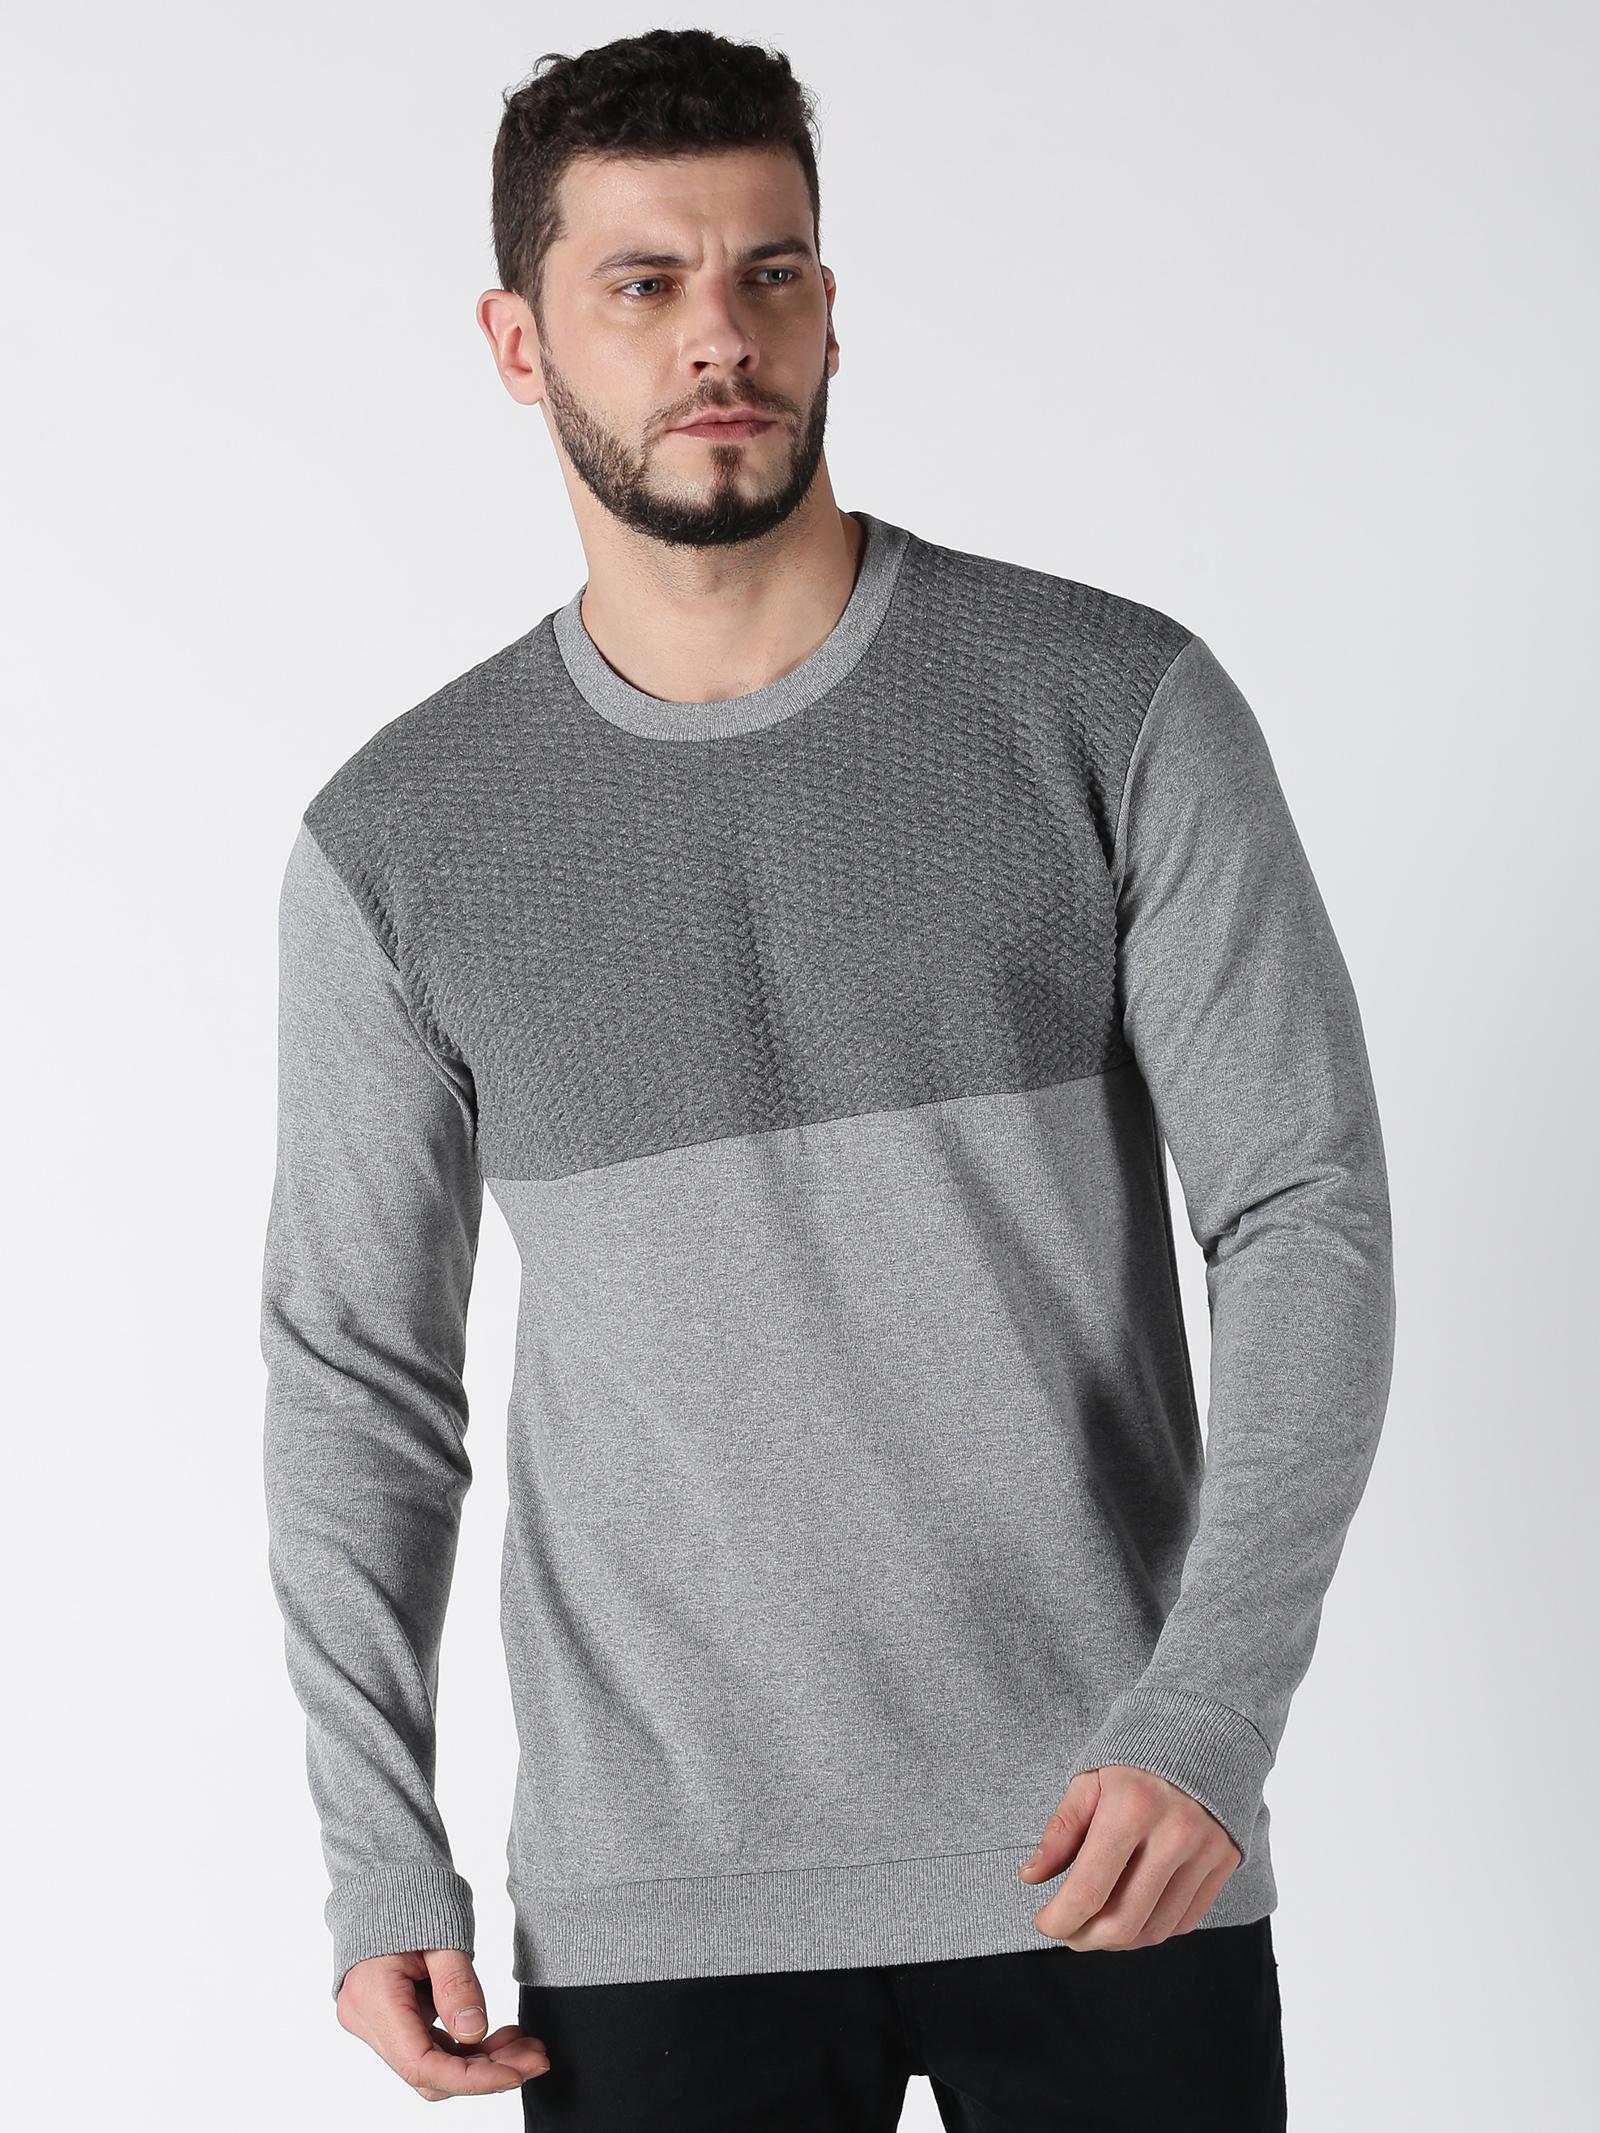 UrGear   Urgear Colourblock Round Neck Grey Sweatshirt